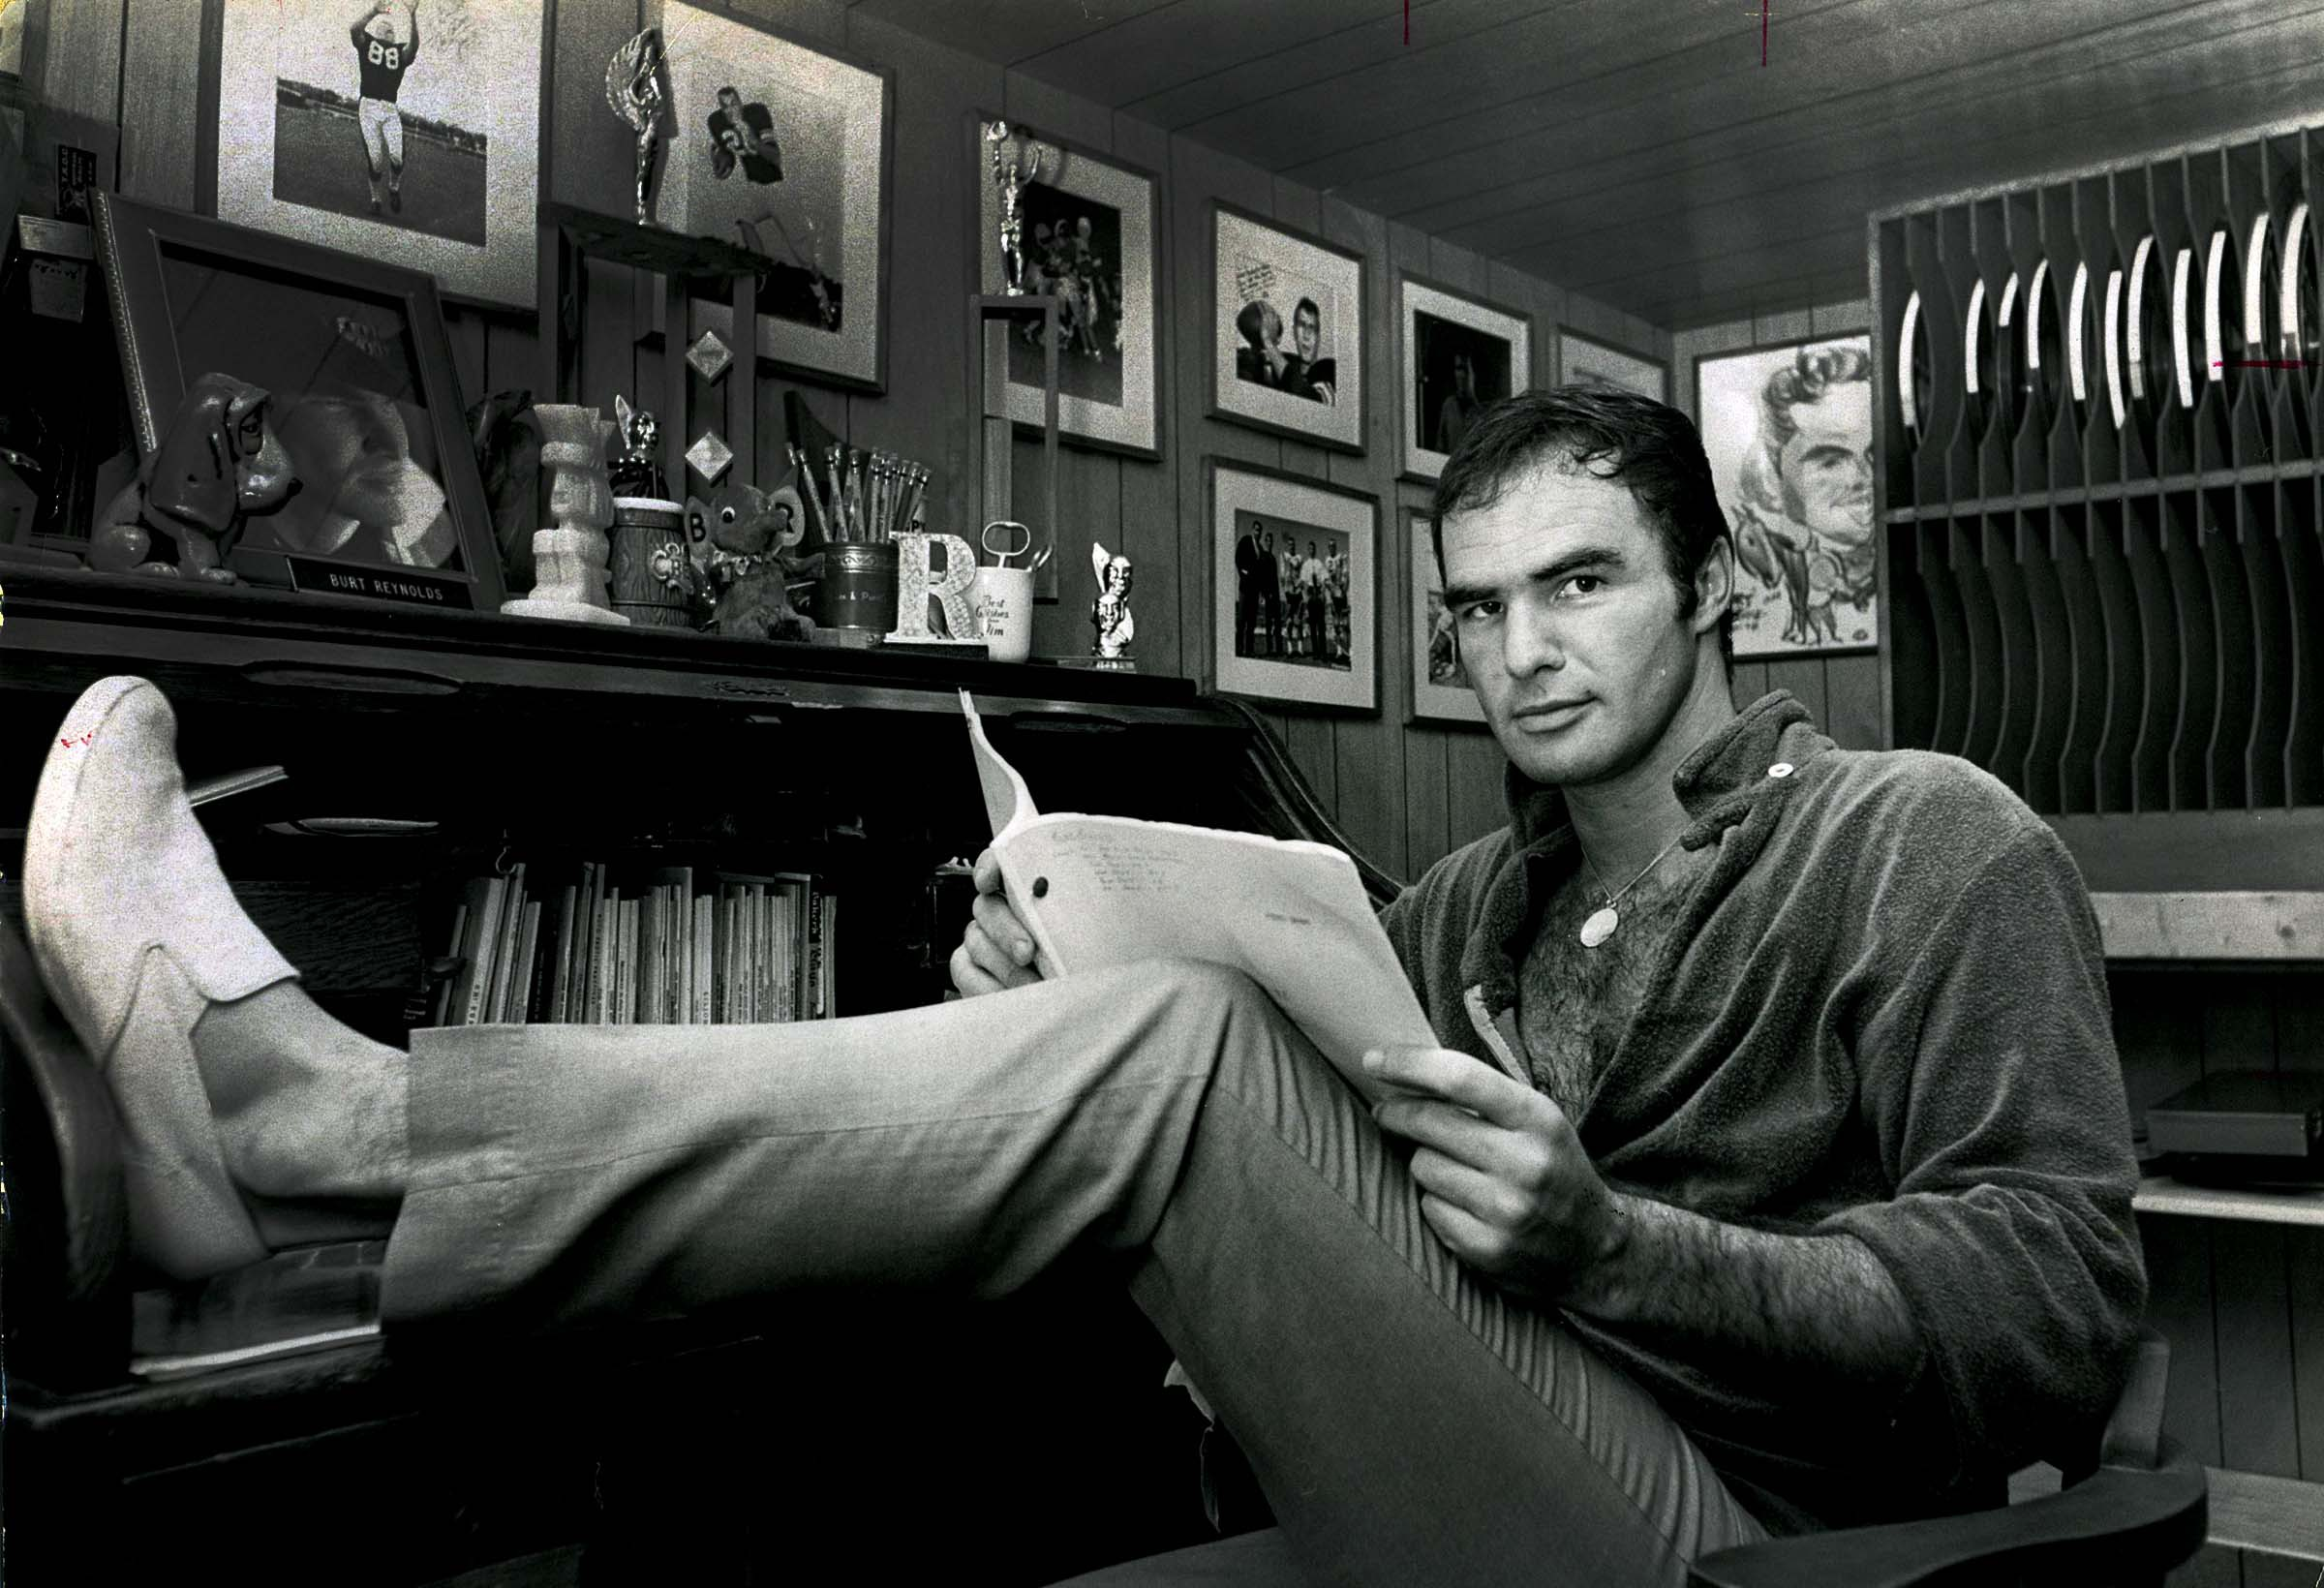 Burt Reynolds Photos